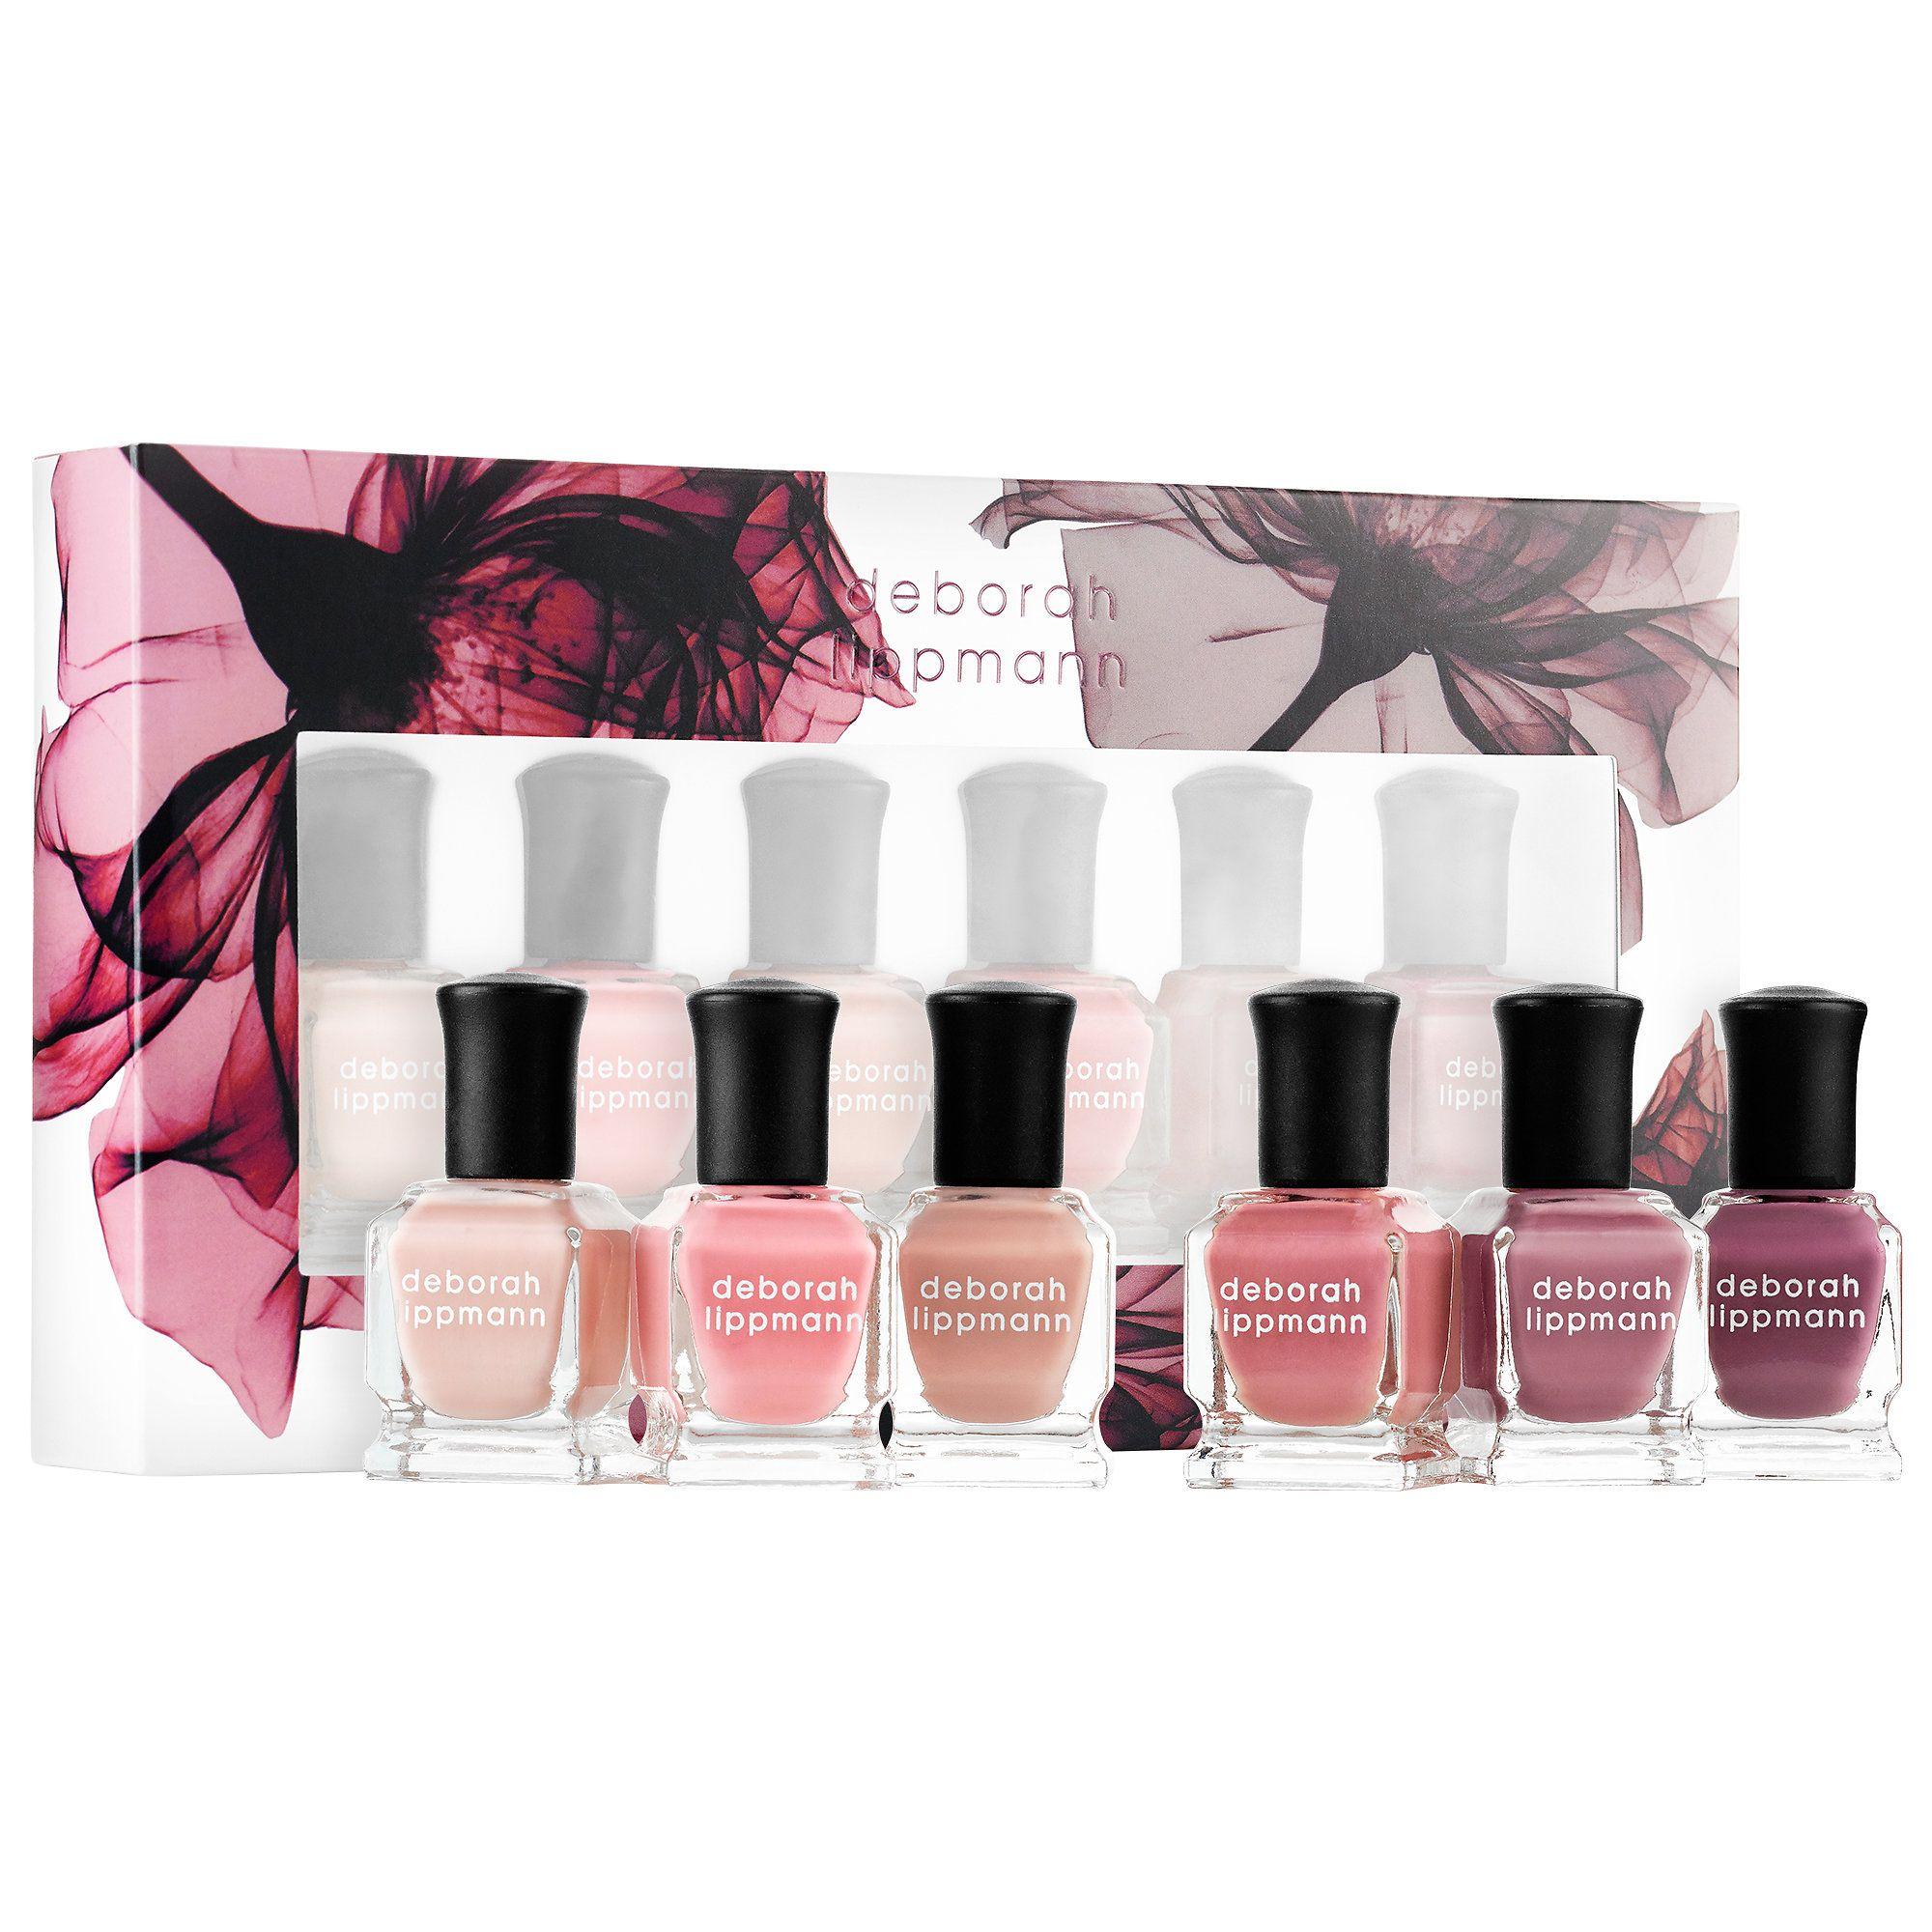 Shop Deborah Lippmann\'s Bed of Roses Nail Polish Set at Sephora. It ...